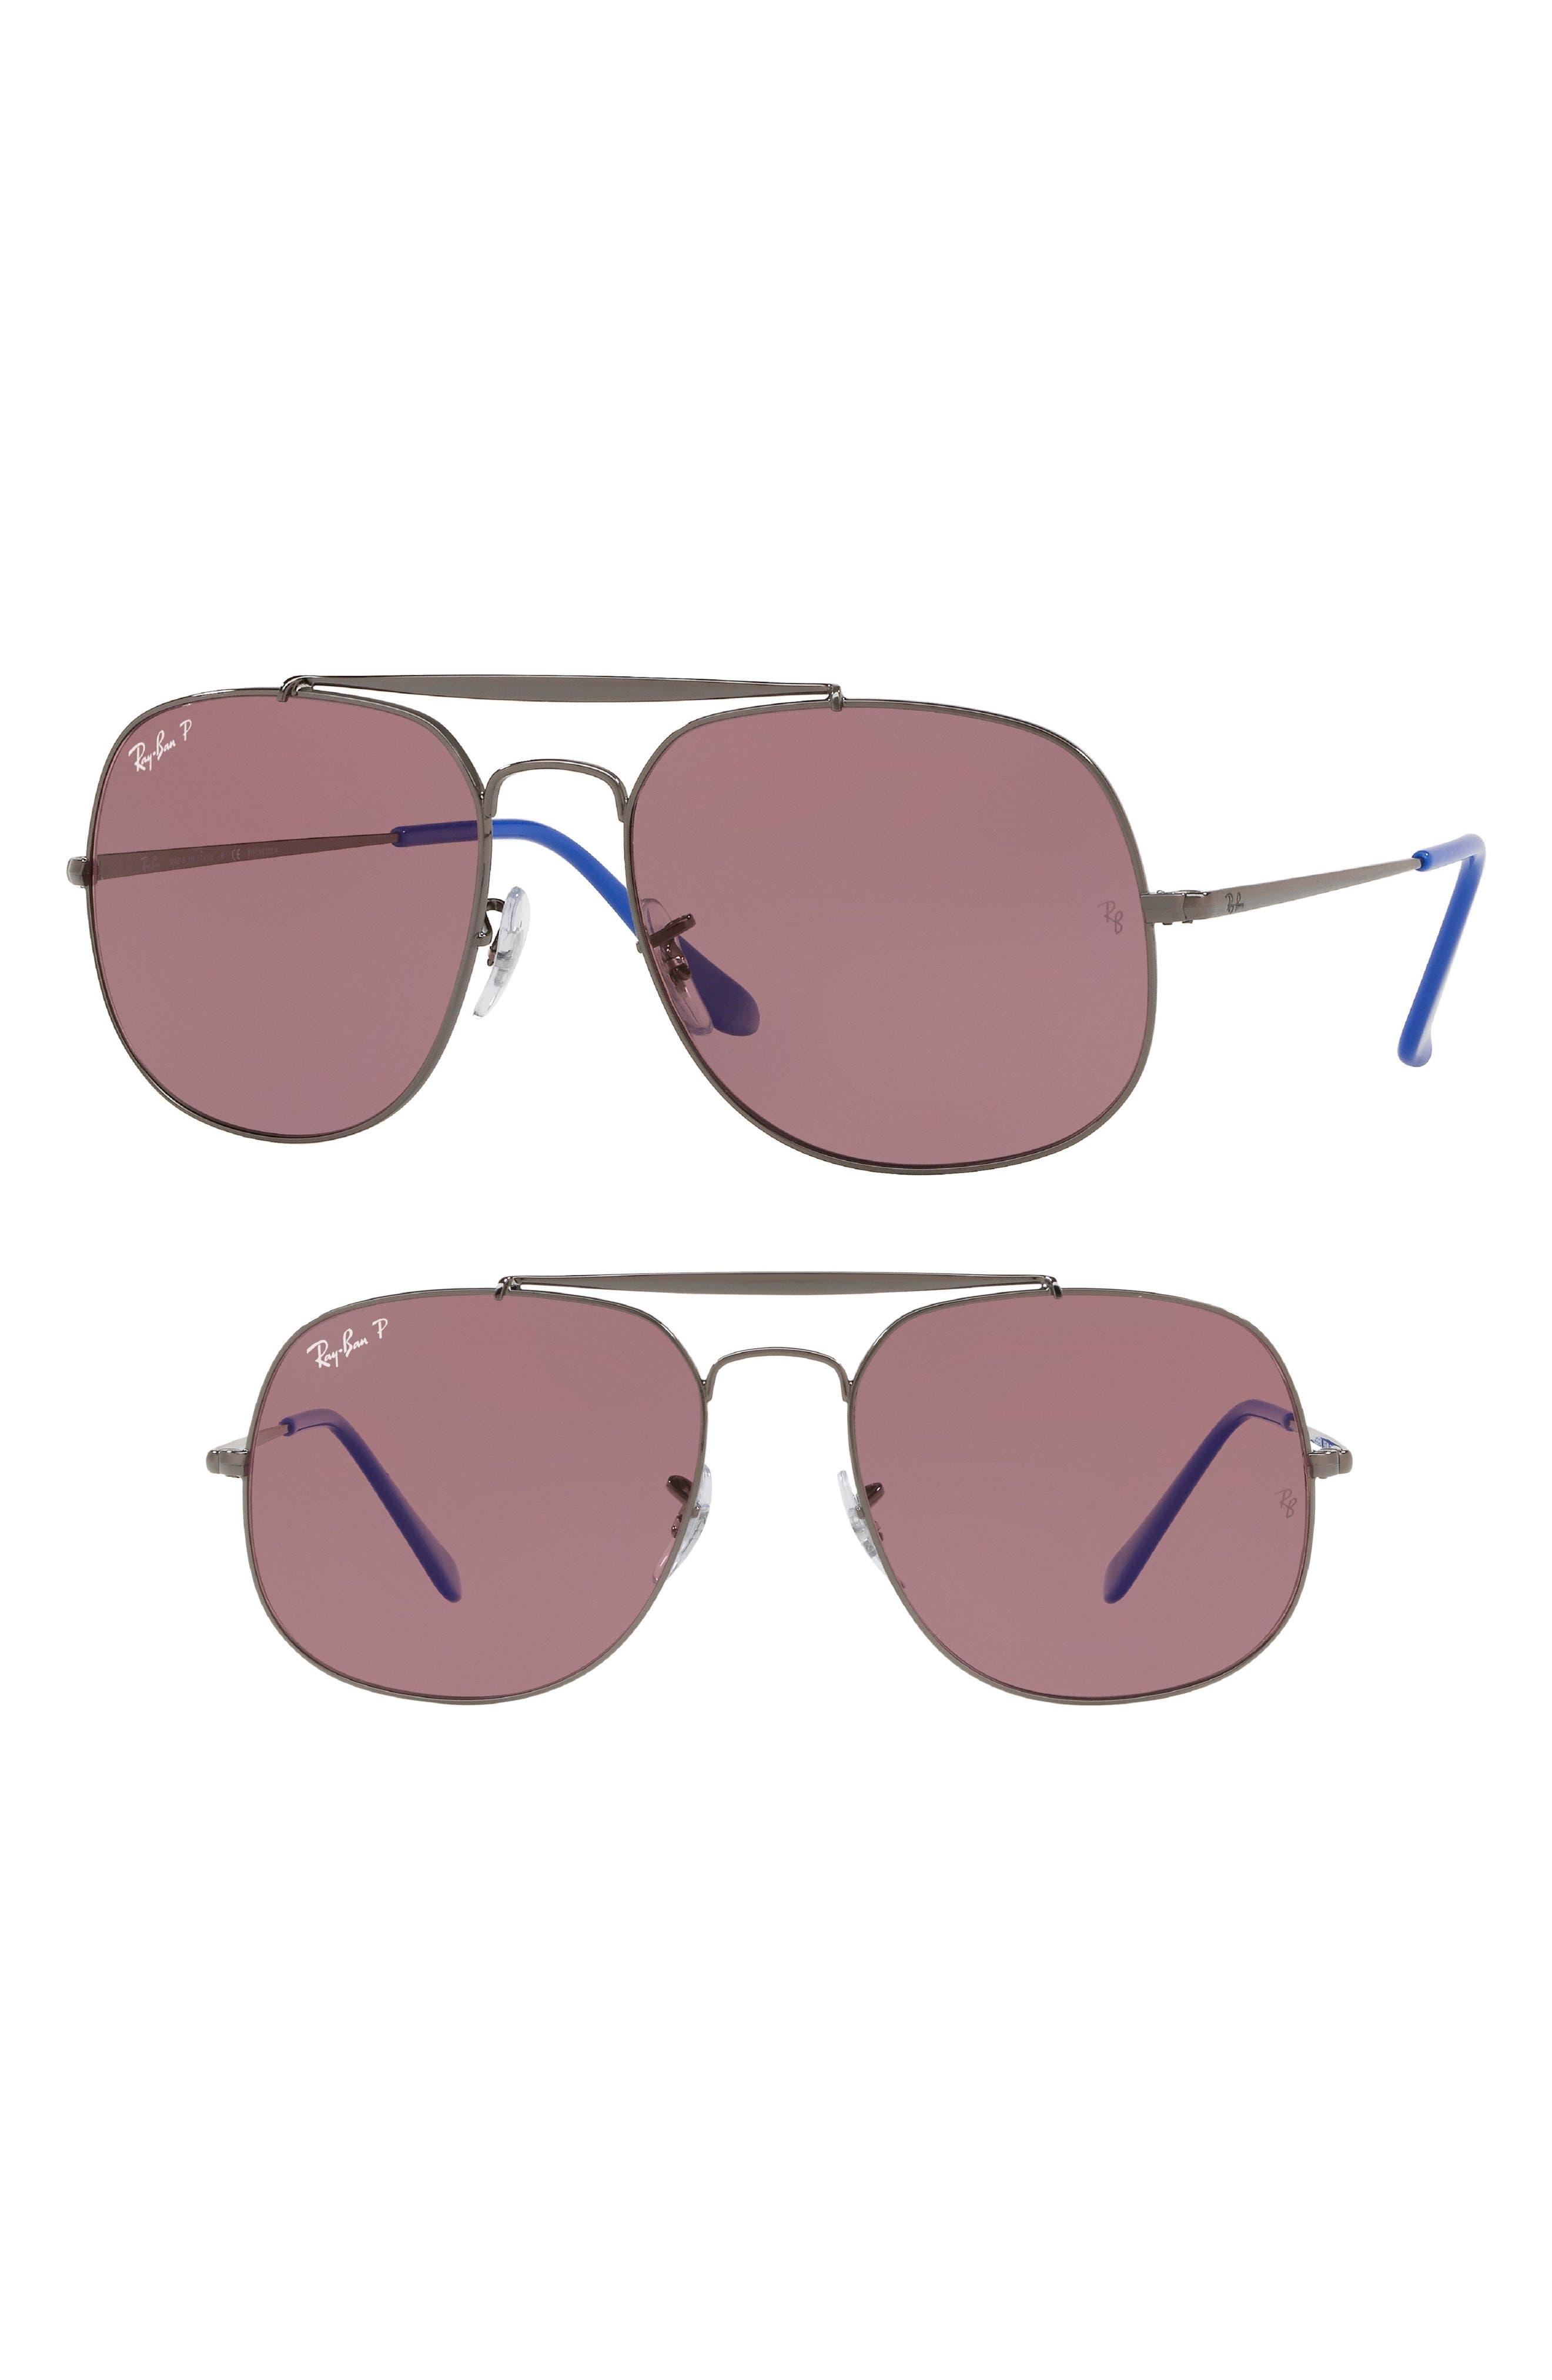 57mm Polarized Aviator Sunglasses,                         Main,                         color, 003